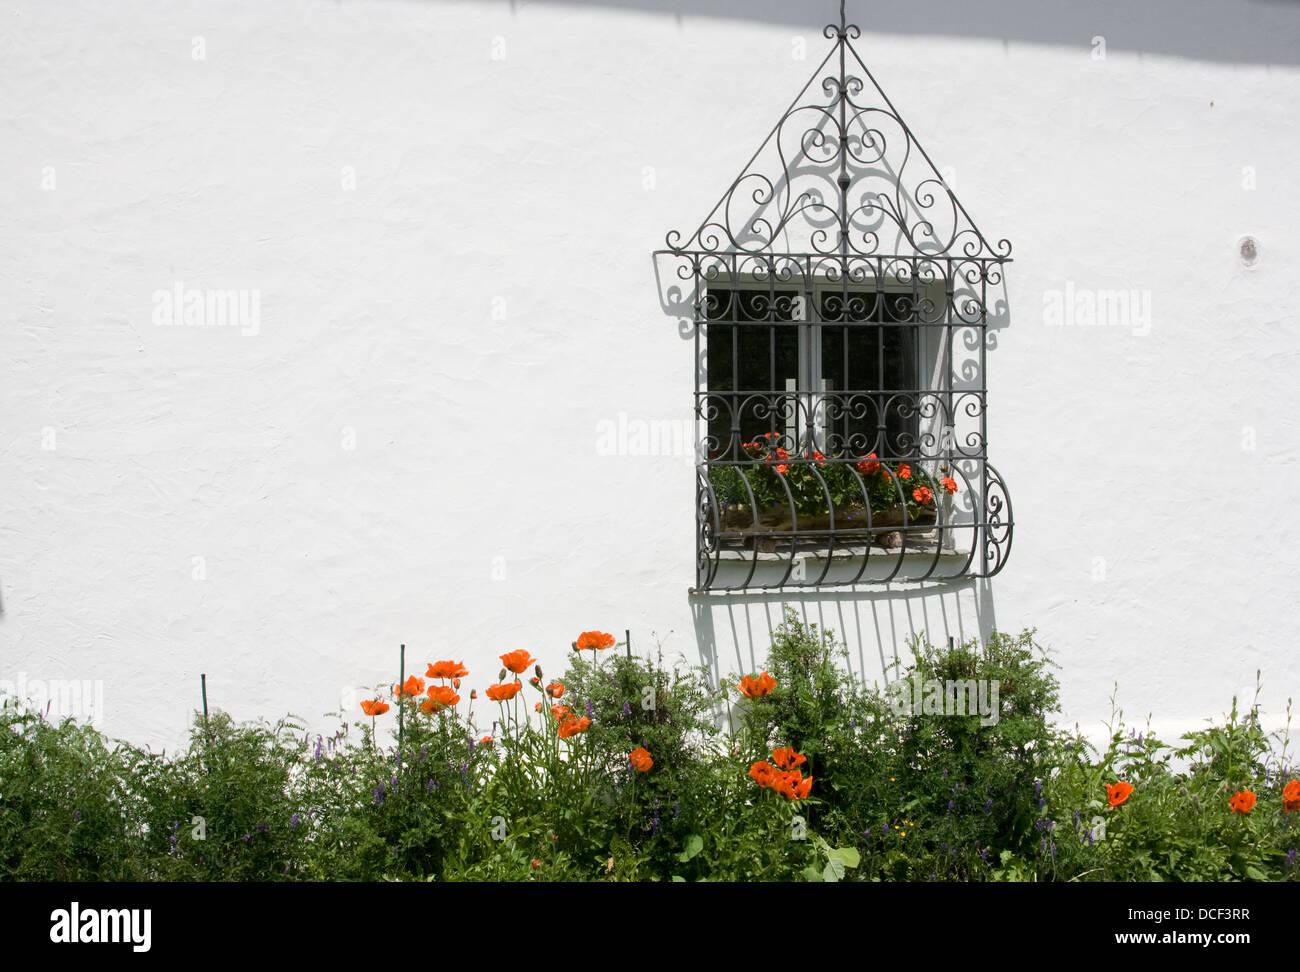 Fenster/window in Sils; - Stock Image